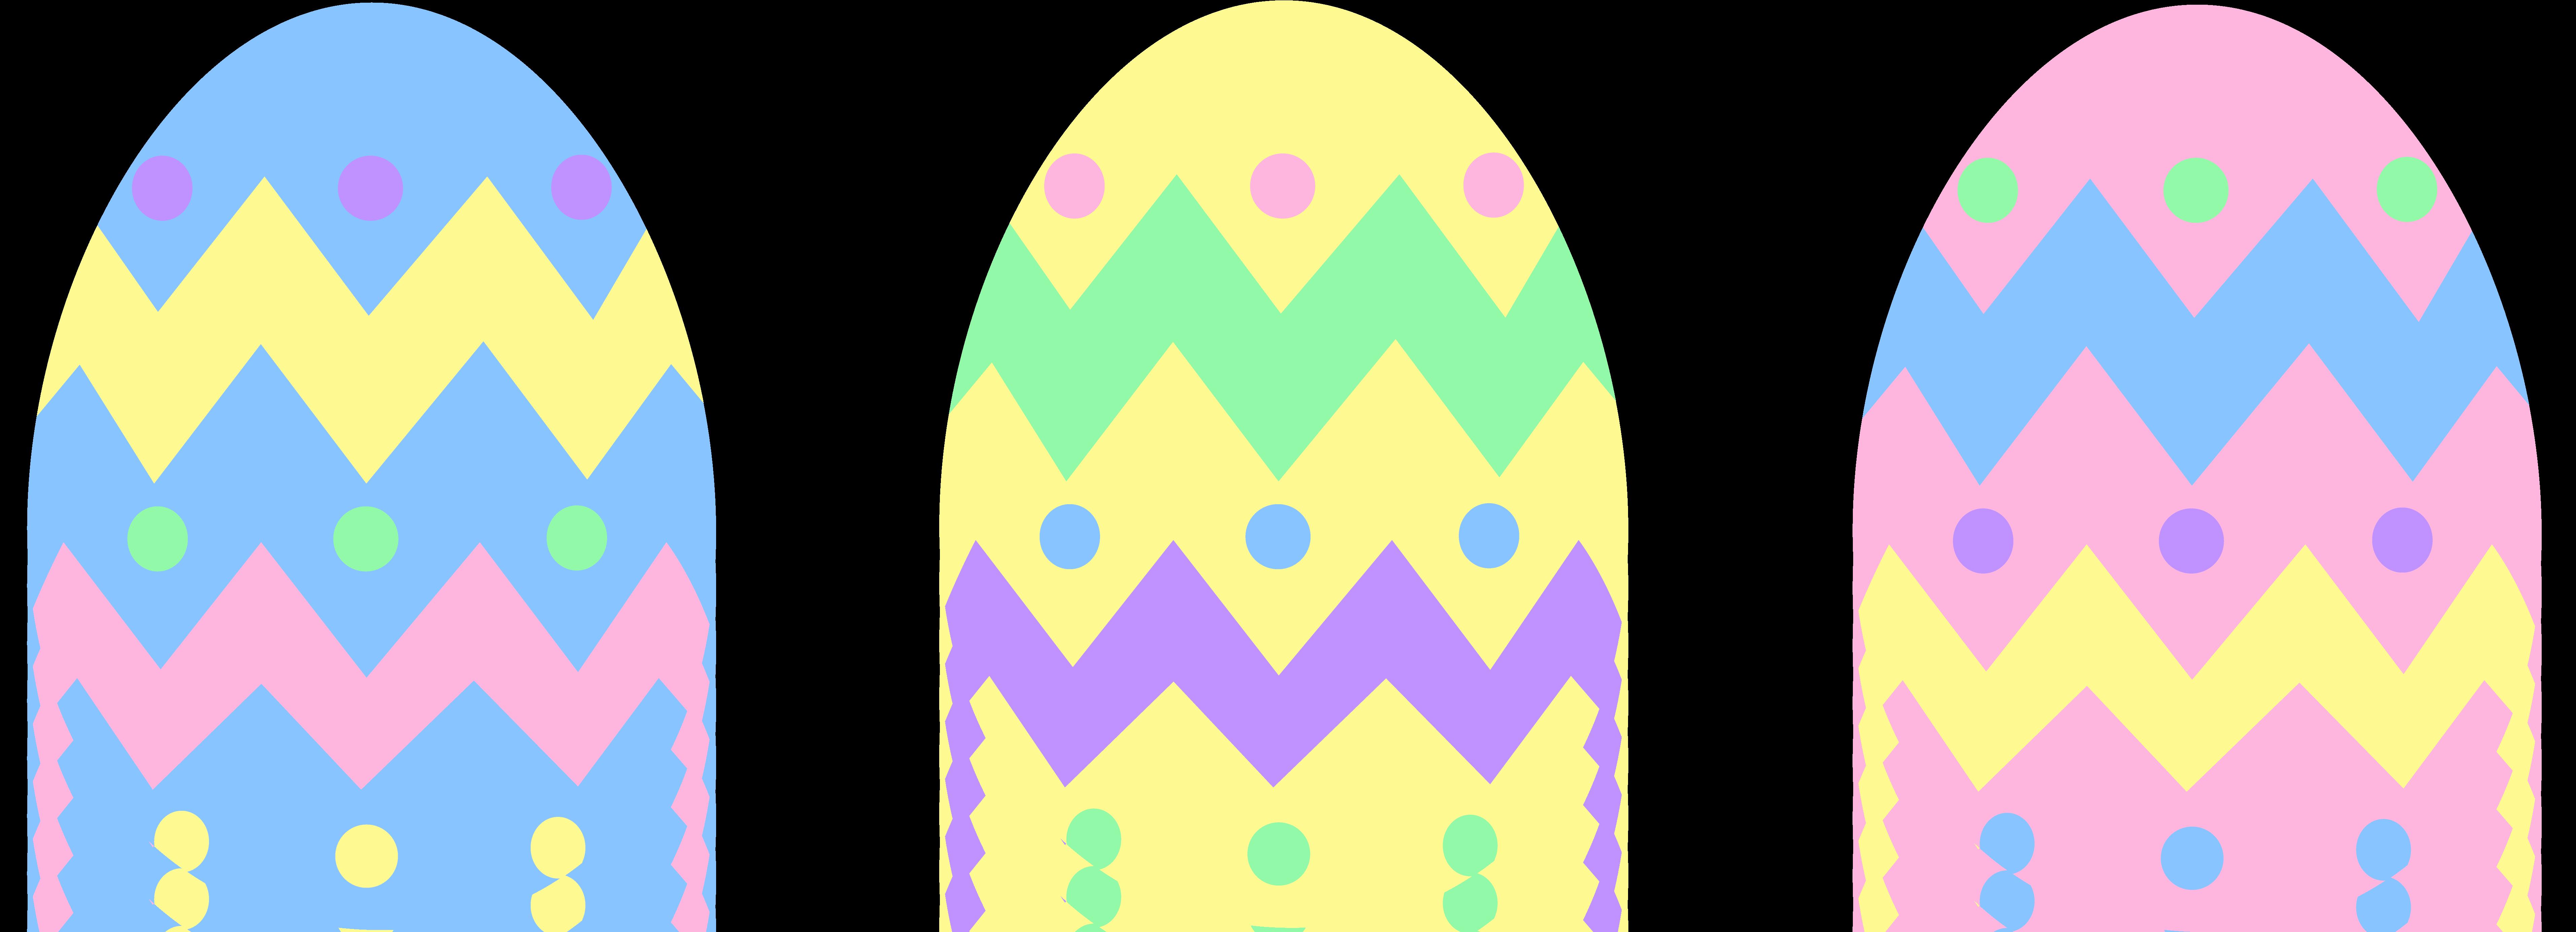 7655x2769 Stunning Design Ideas Easter Eggs Clipart Clip Art Etsy